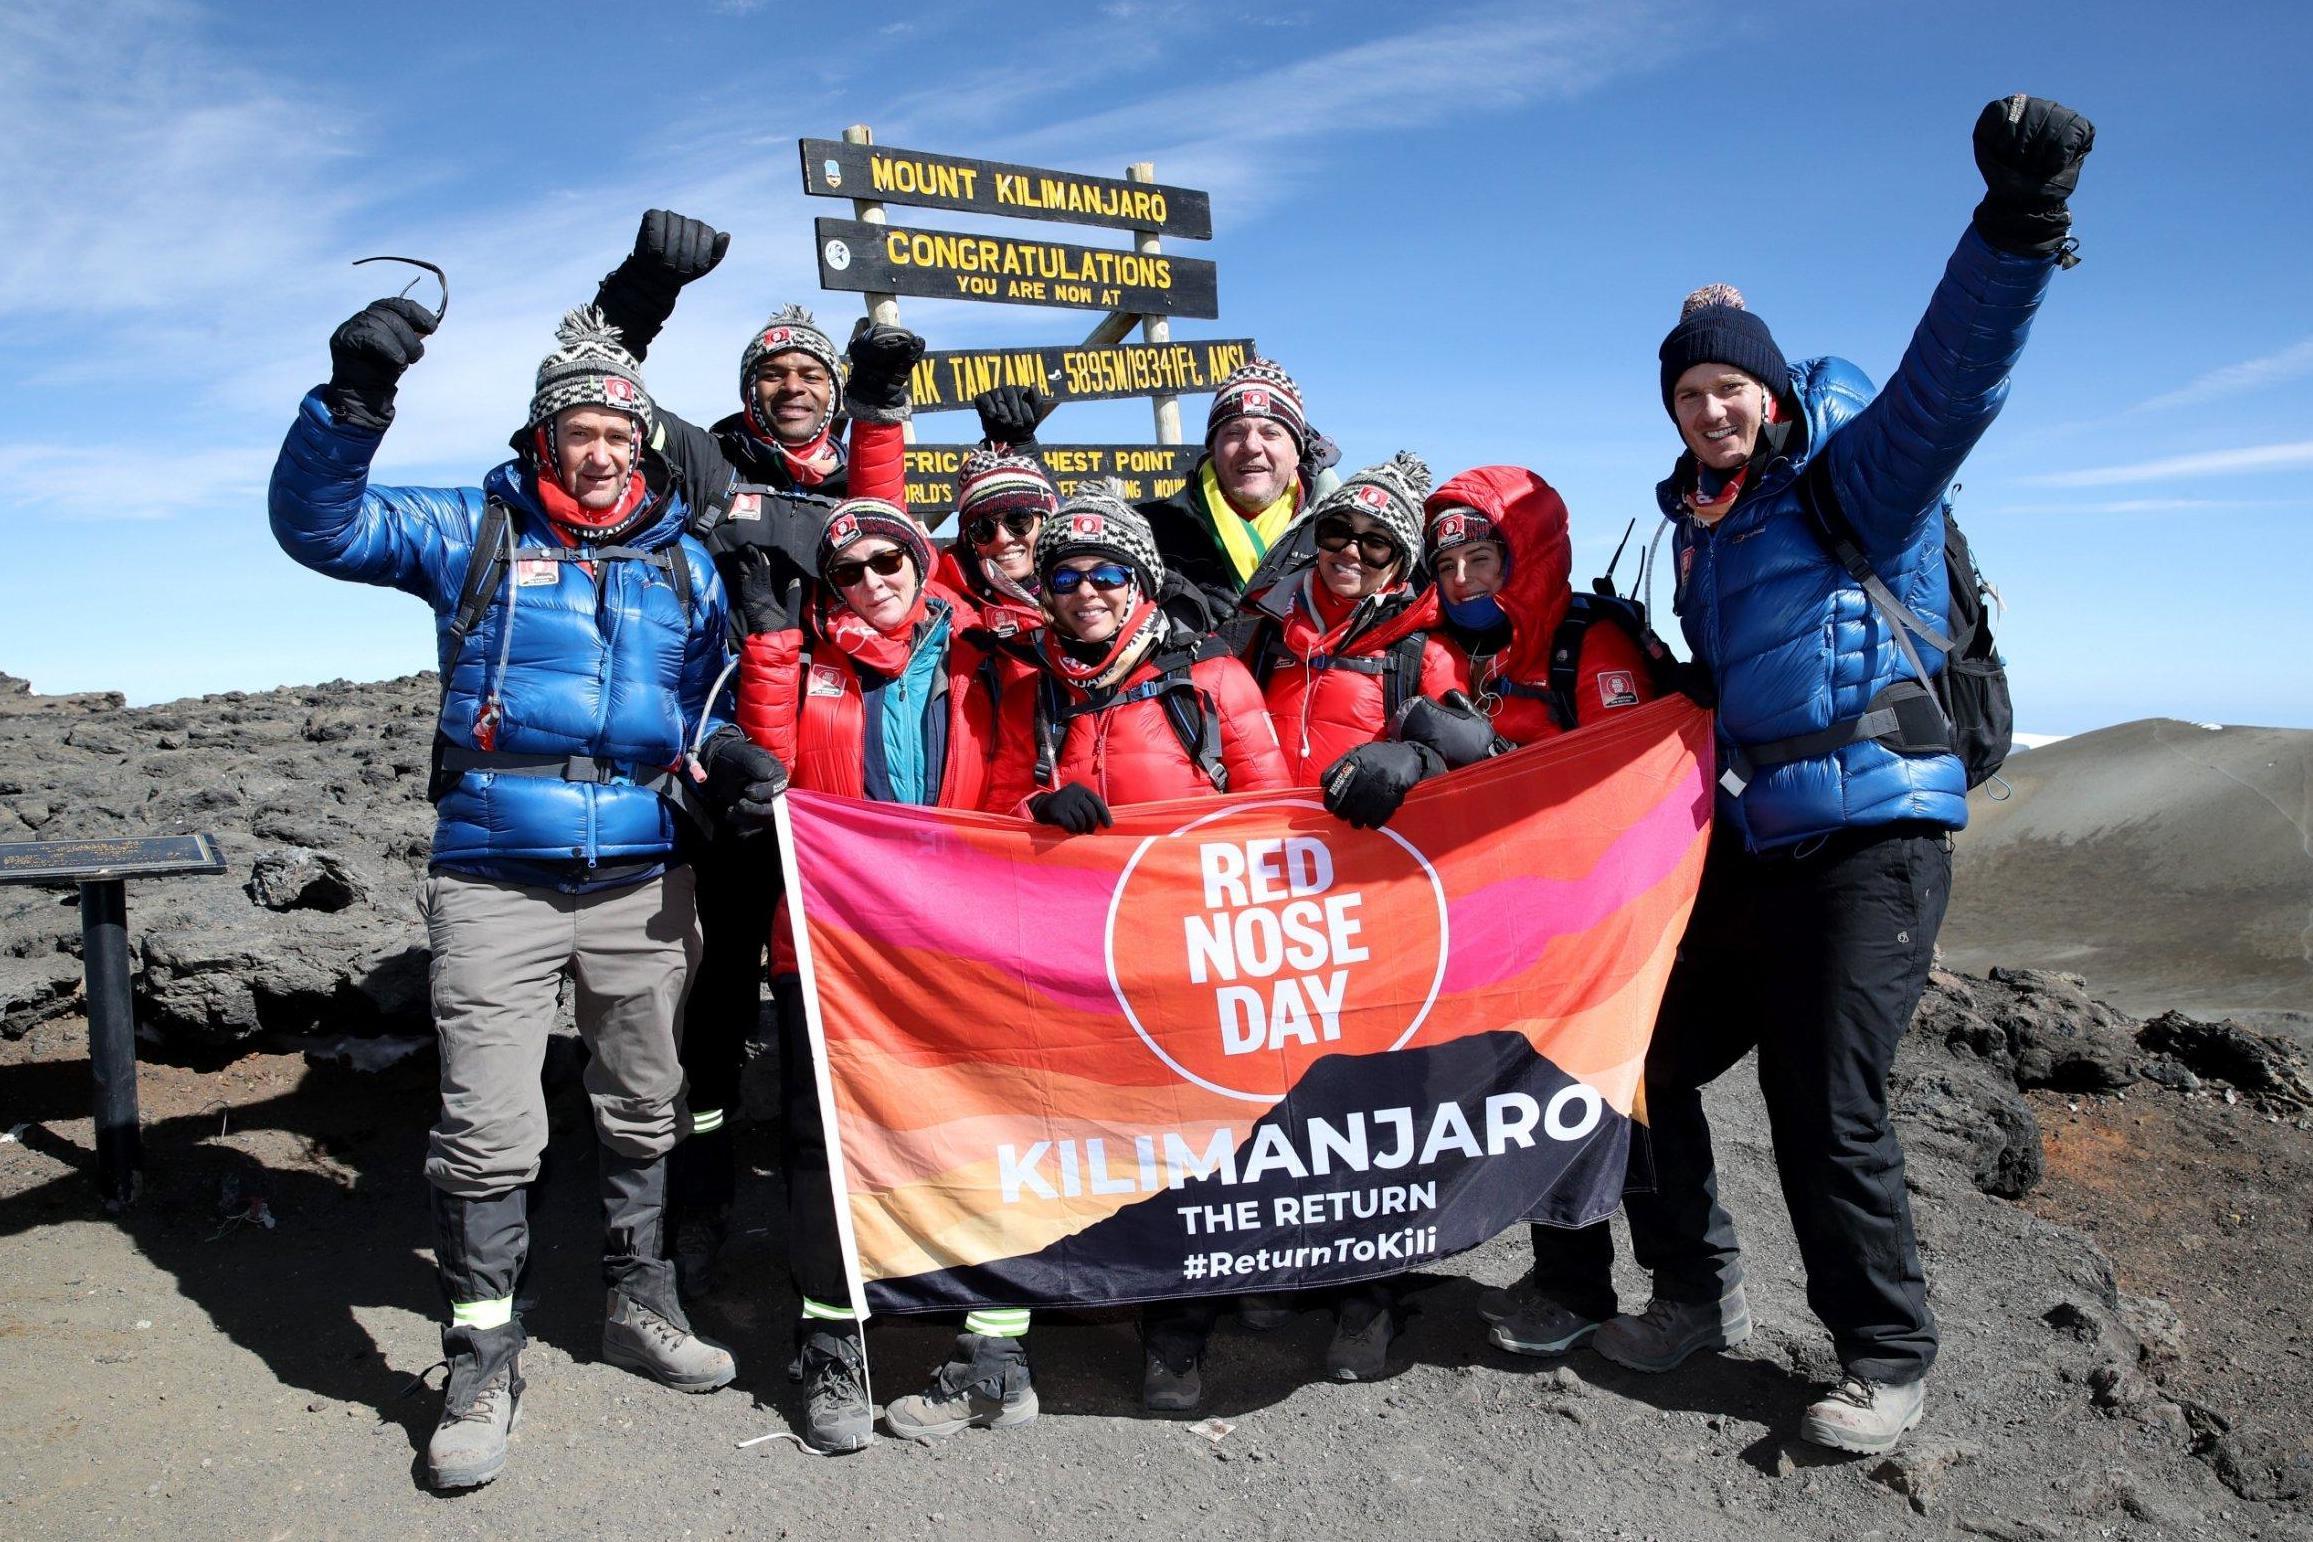 Kilimanjaro, The Bigger Red Nose Climb review: Charity trek